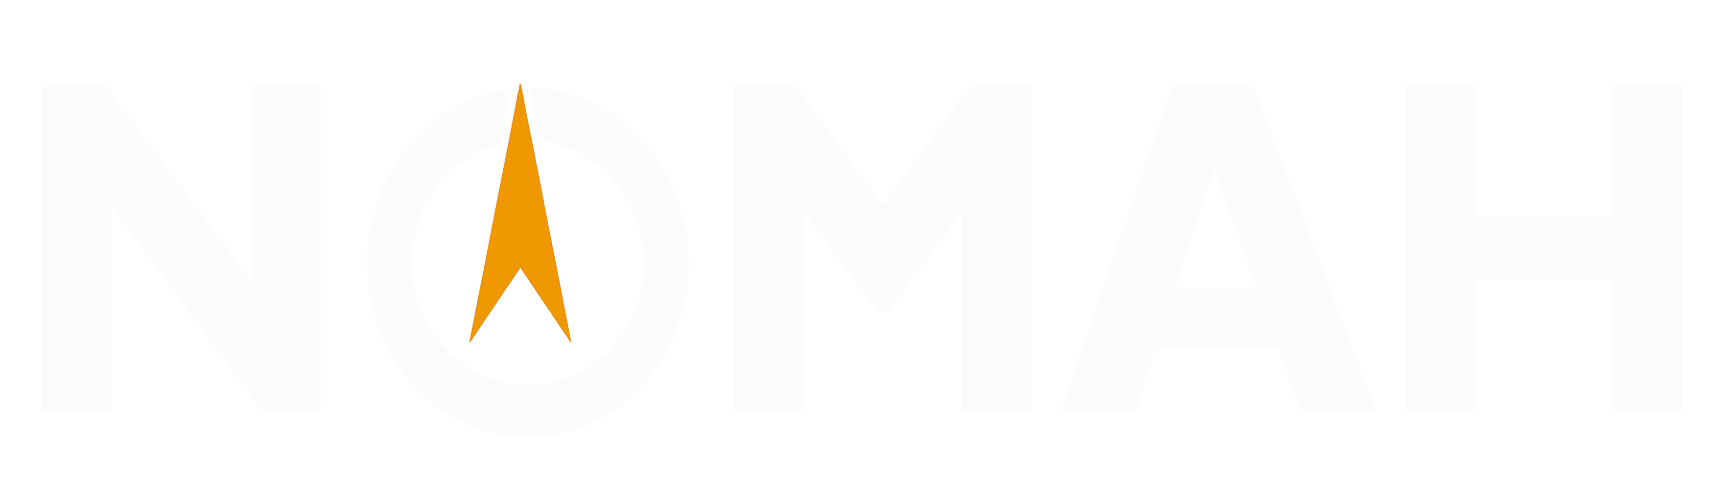 los viajes de nomah